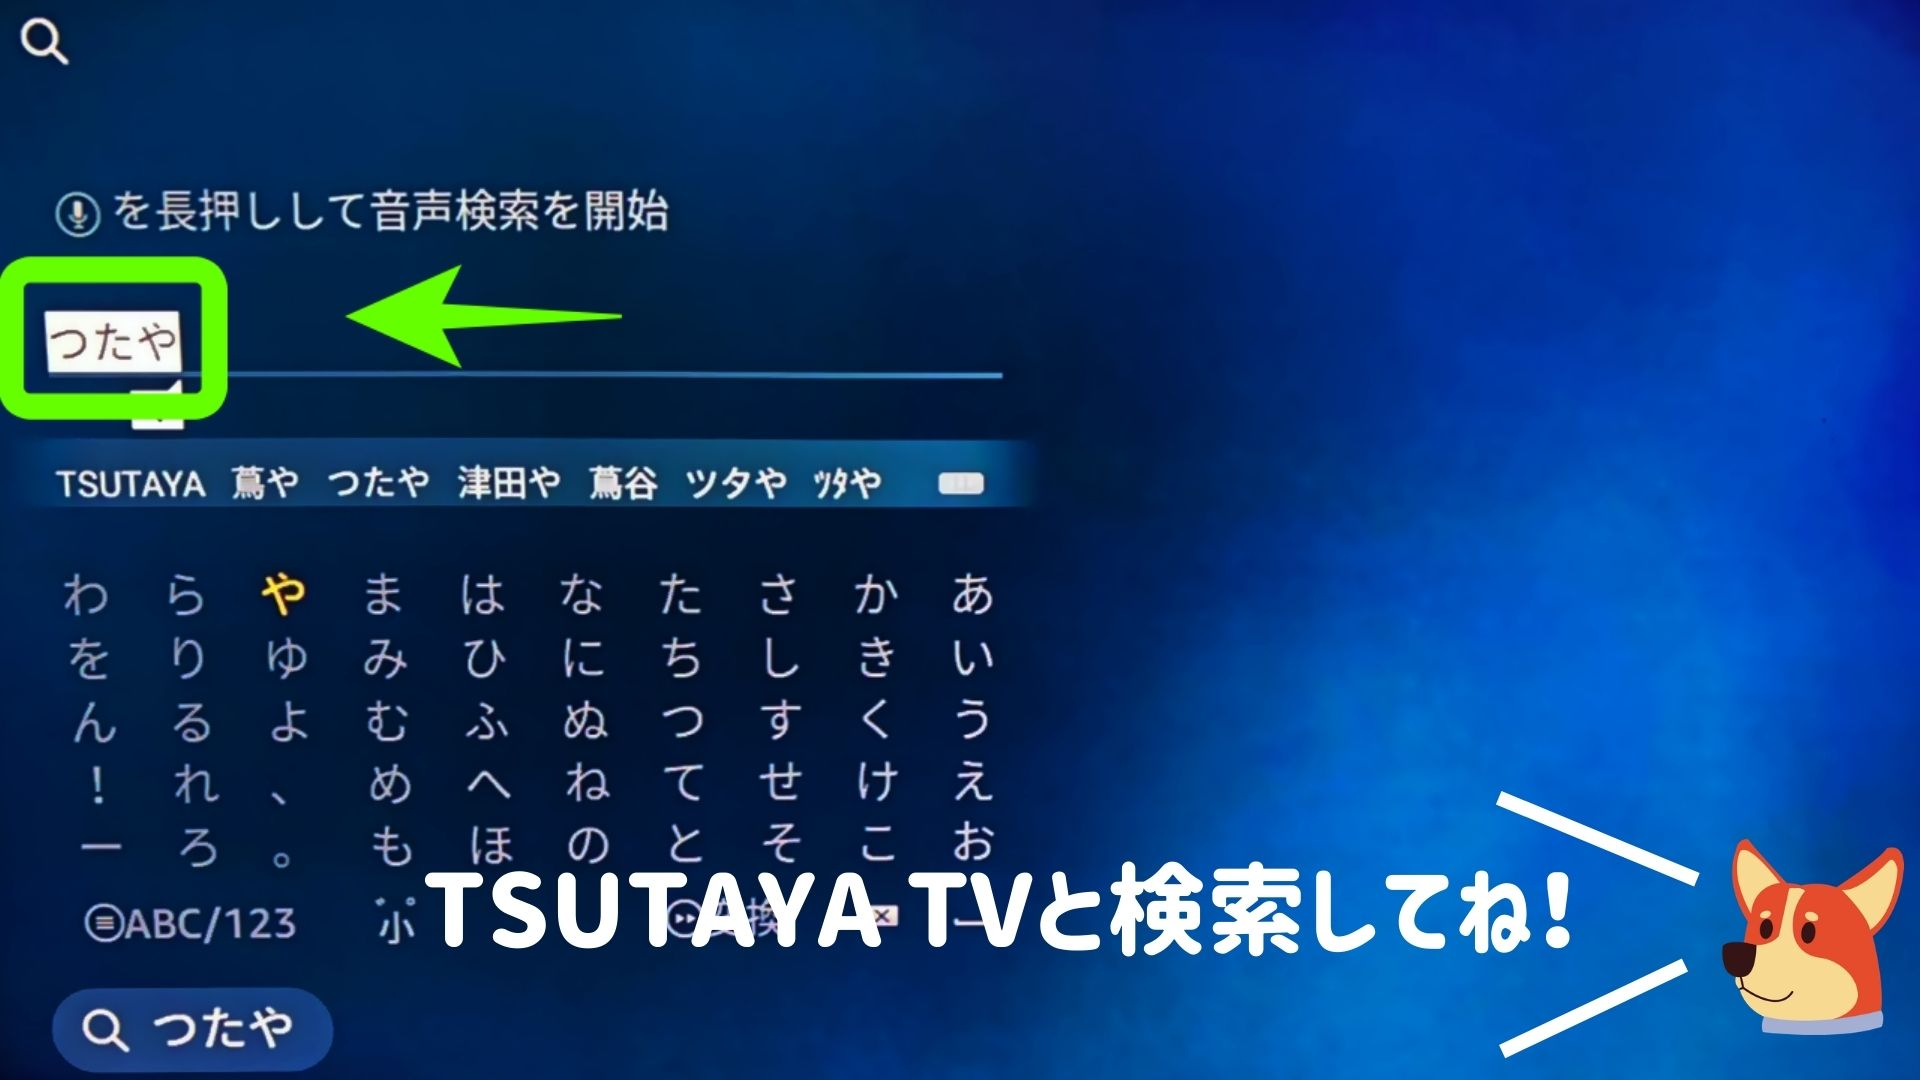 Fire TV StickでTSUTAYA TVを検索している